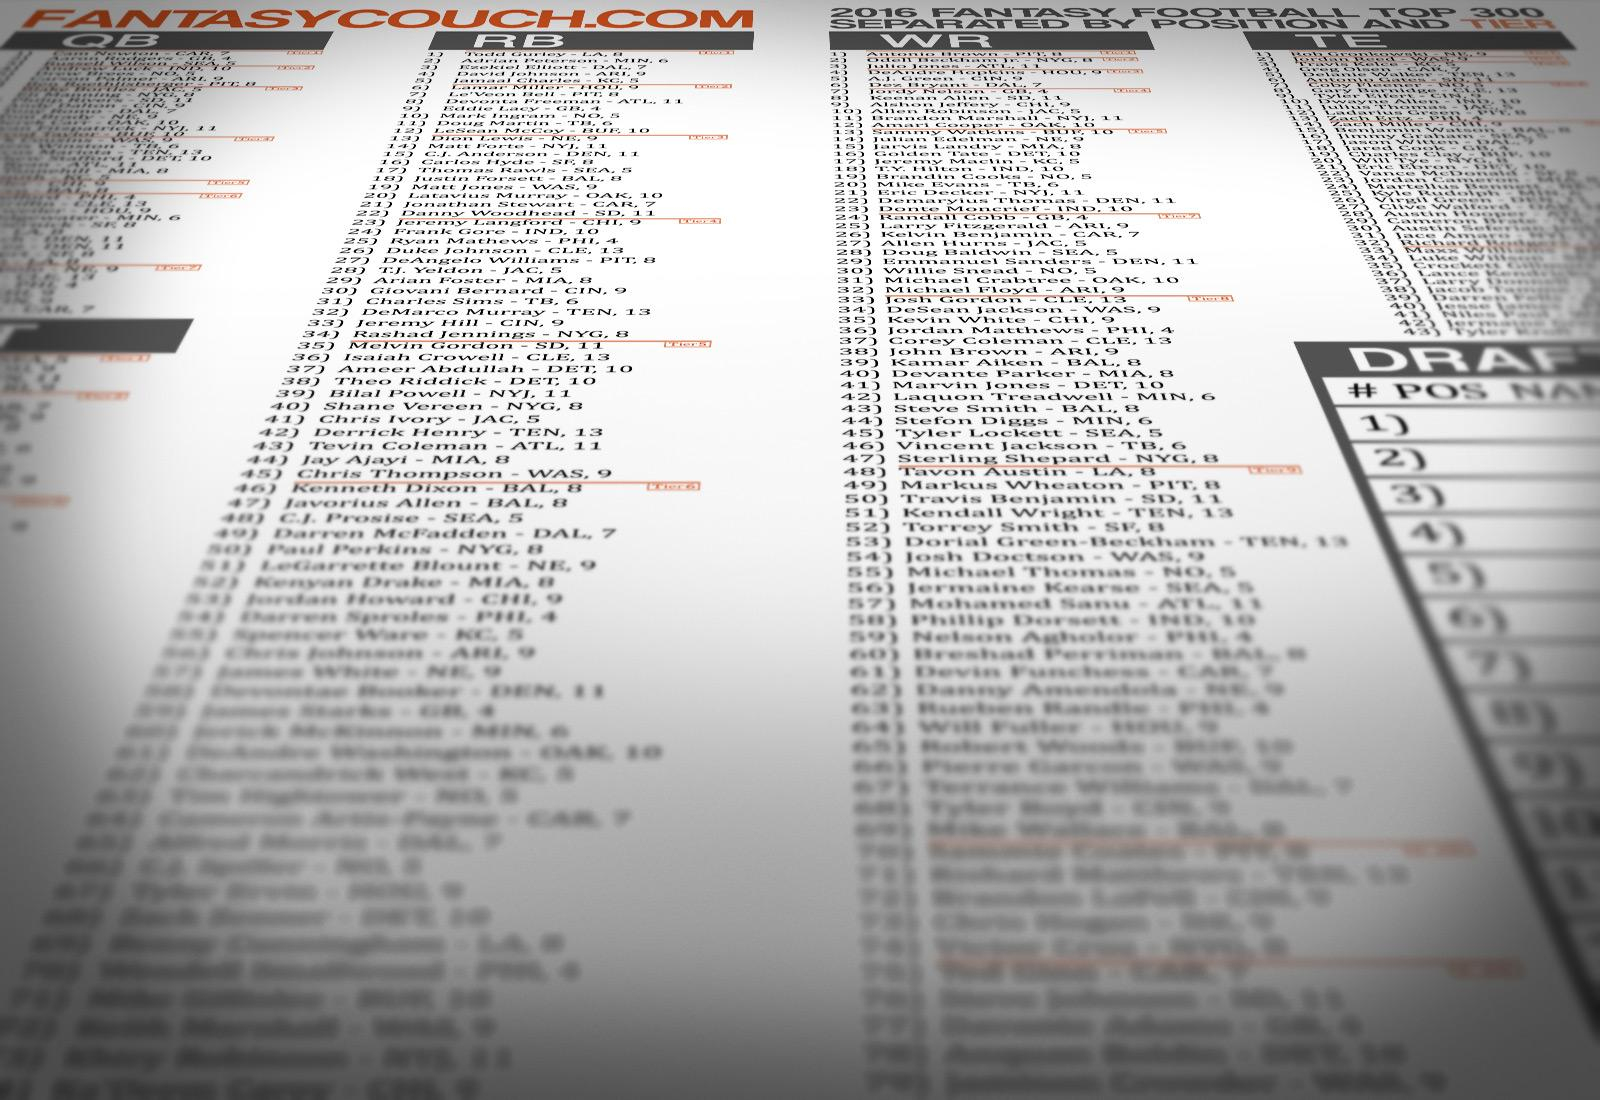 Top 300 List - Fantasy Football 2018 Cheat Sheet - Fantasy Football Cheat Sheets Printable Free